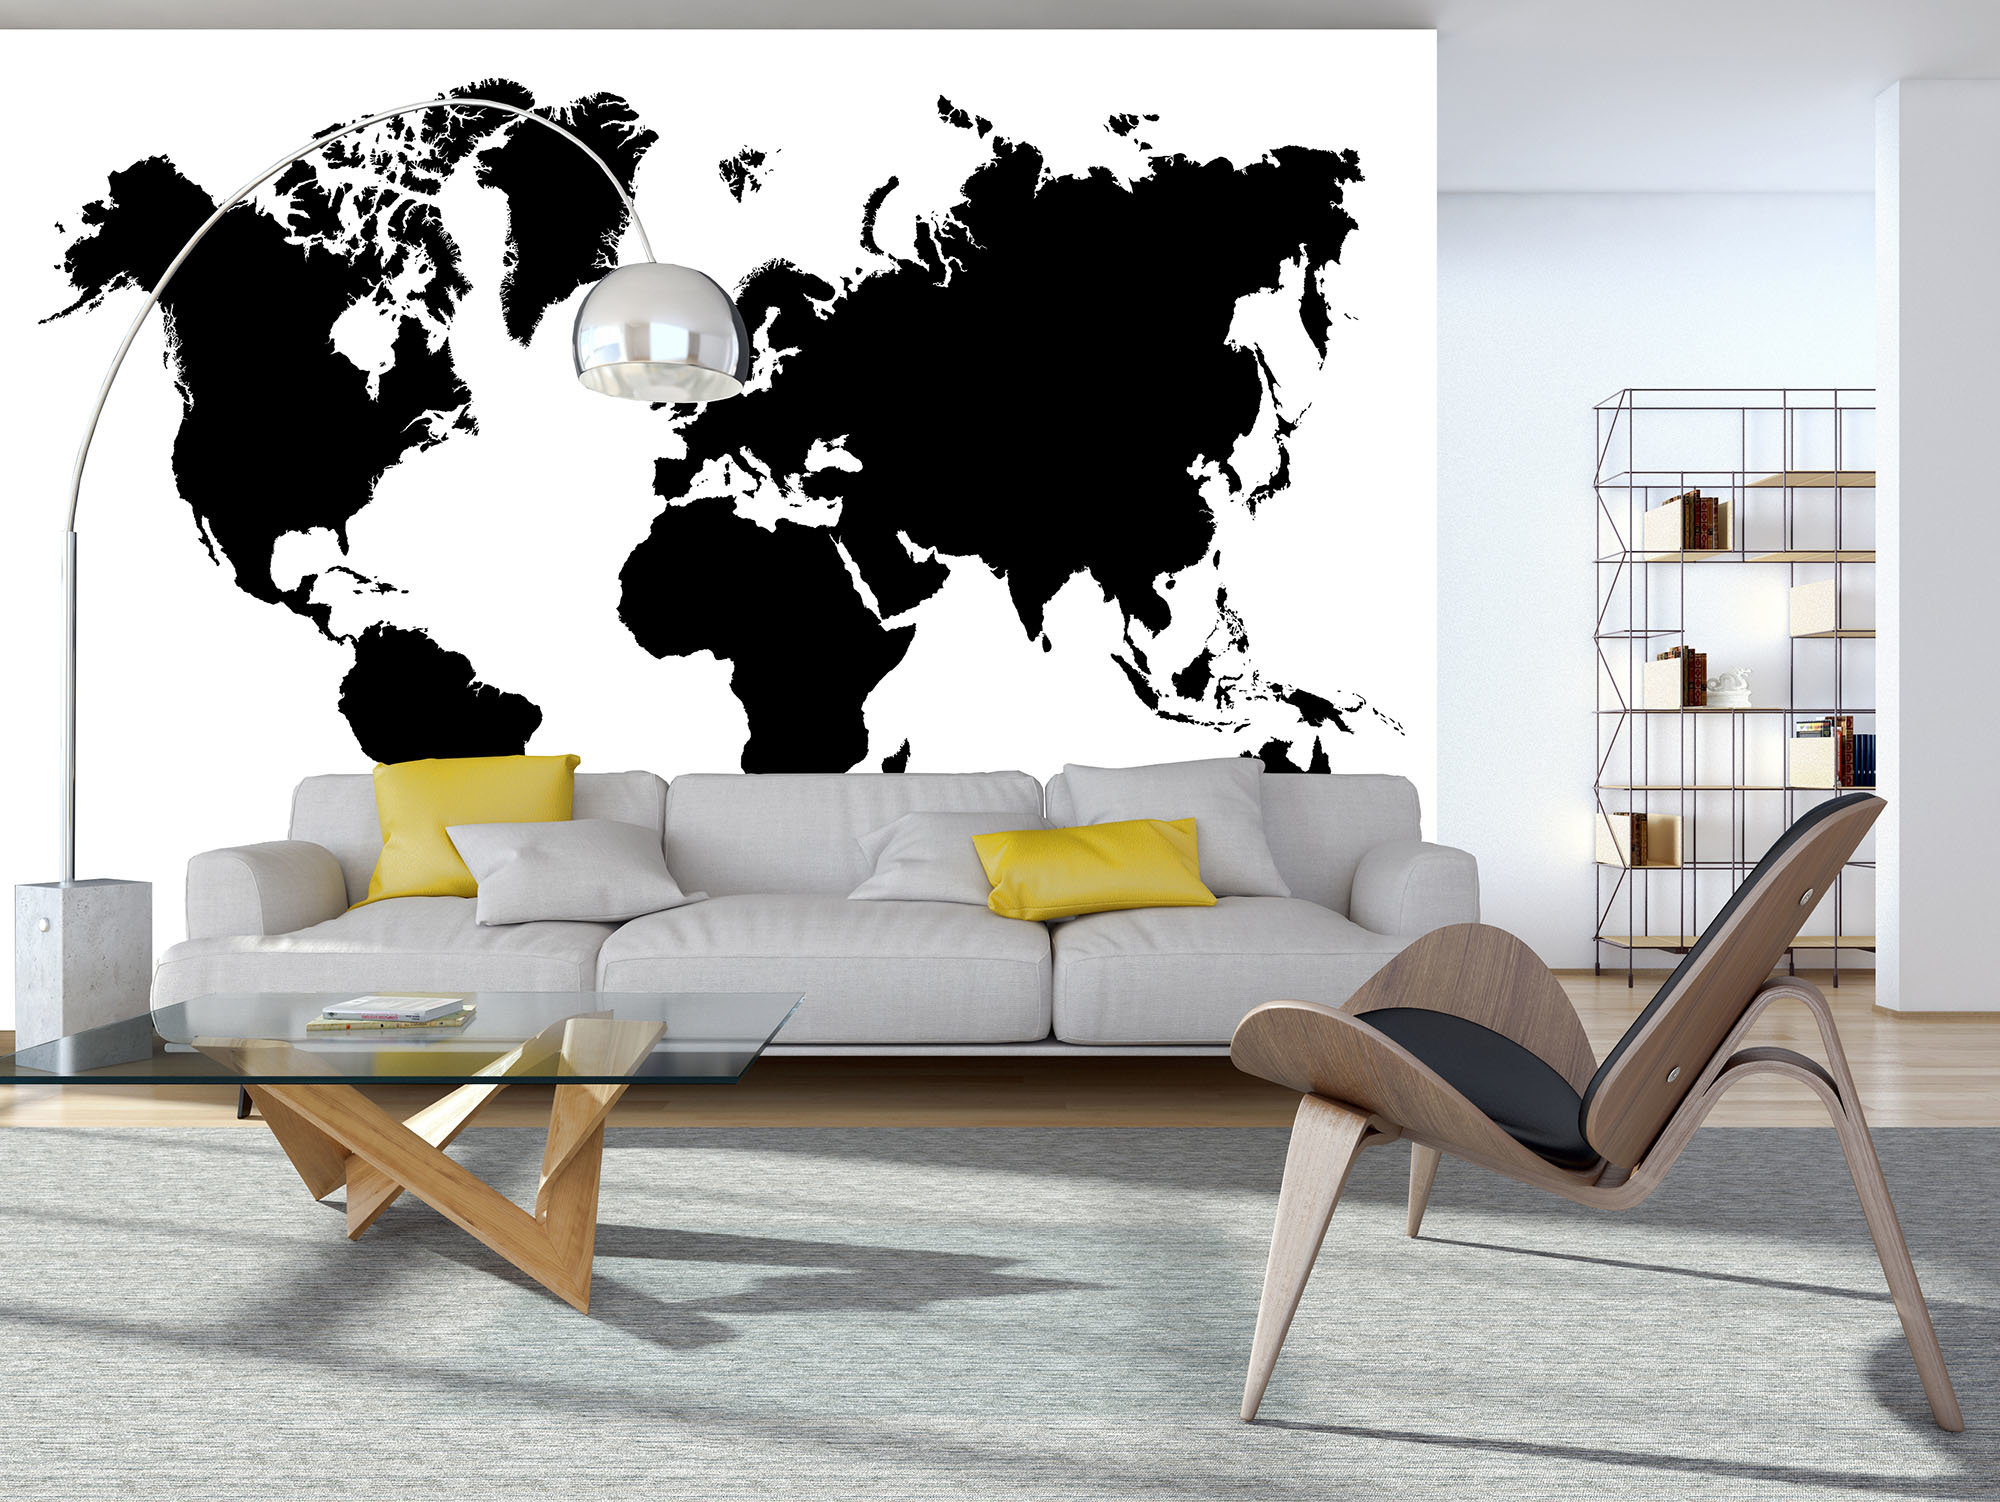 fototapete weltkarte schwarz wei weltderbilder. Black Bedroom Furniture Sets. Home Design Ideas